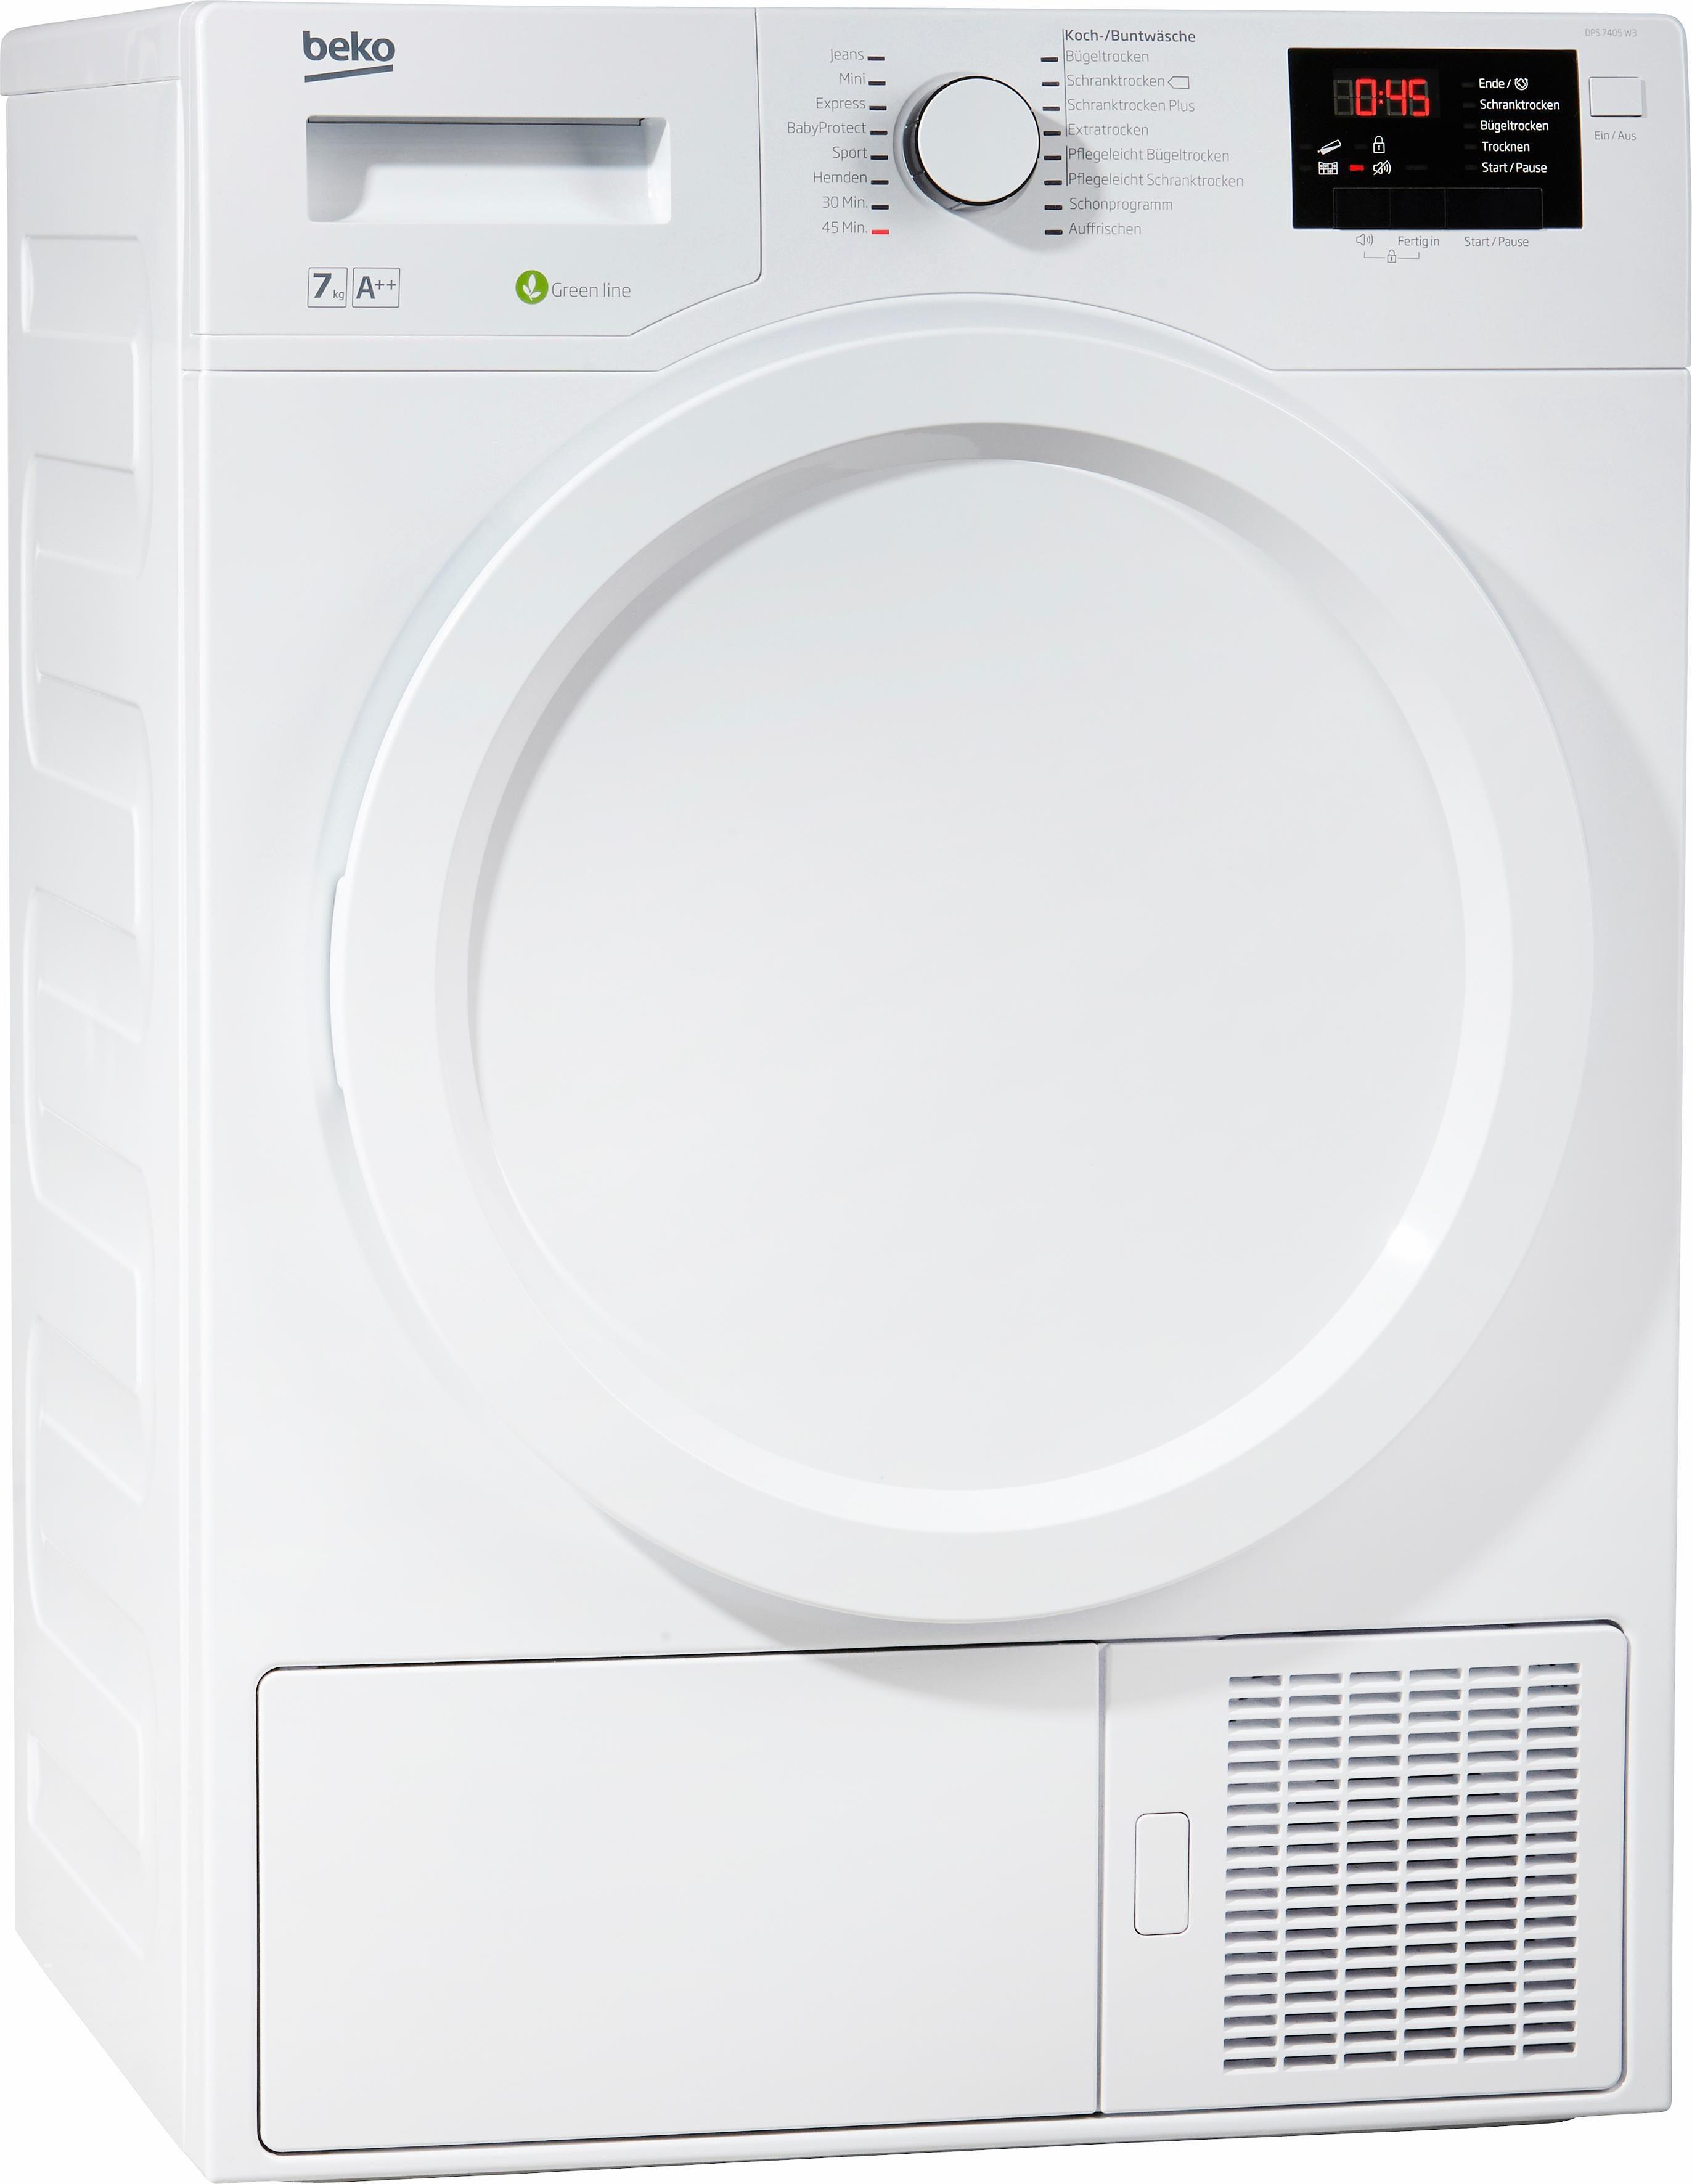 Beko DPS 7405 W 3